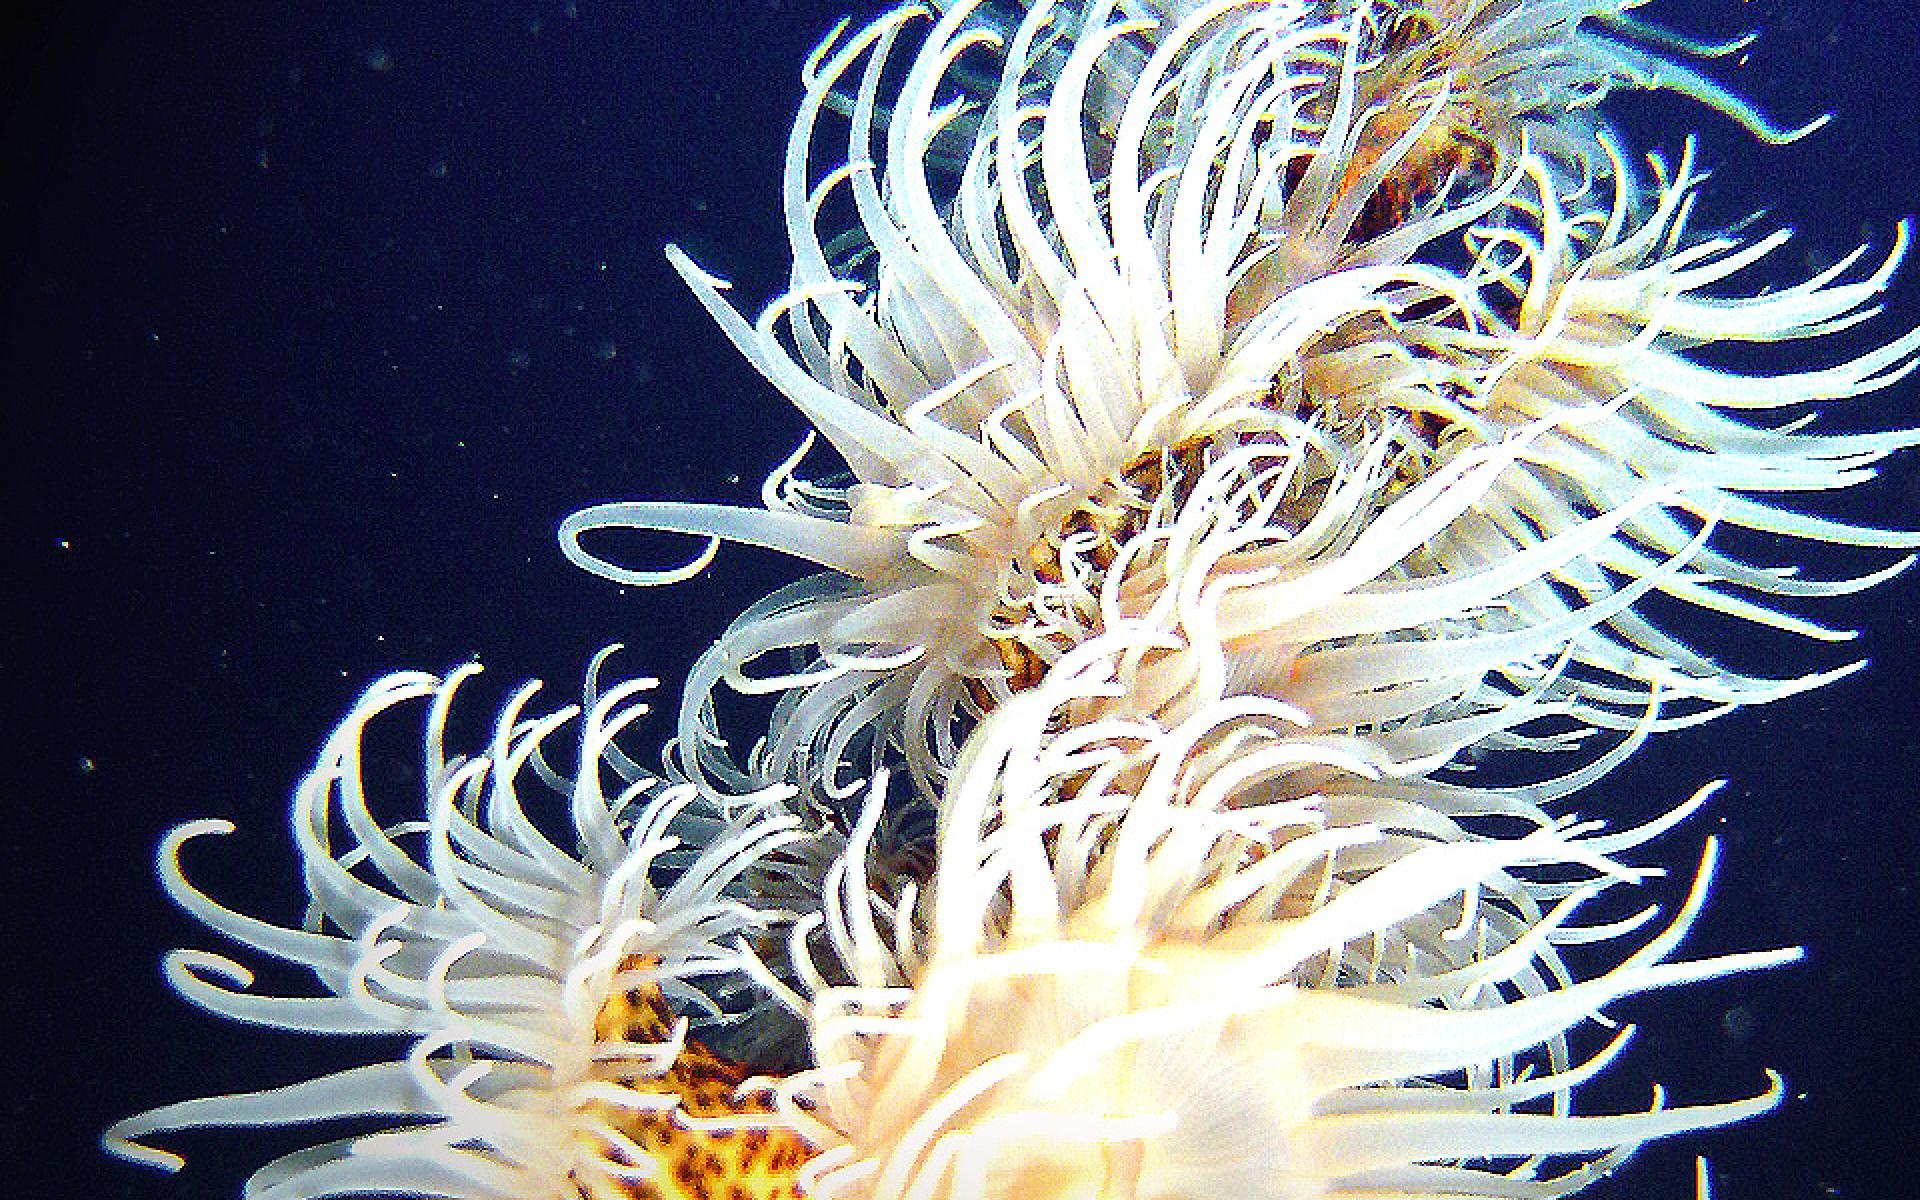 black-coral-033832597A-E40B-796F-01D5-B8AF210749D0.jpg